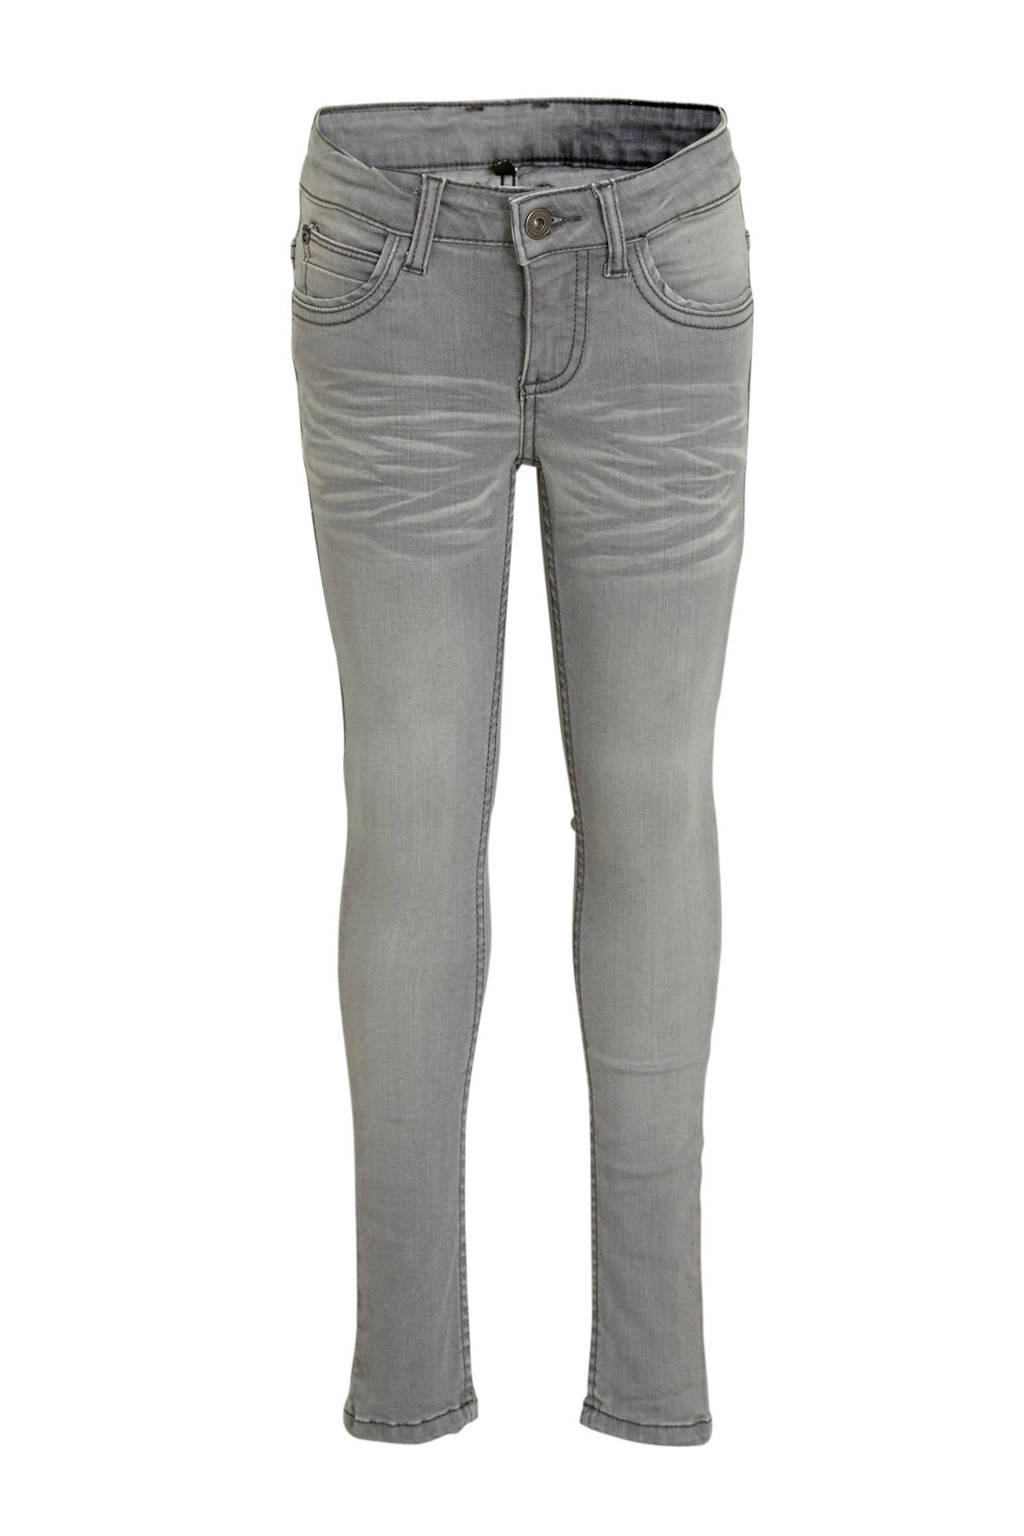 Quapi Girls regular fit jeans Josine grijs, Grijs